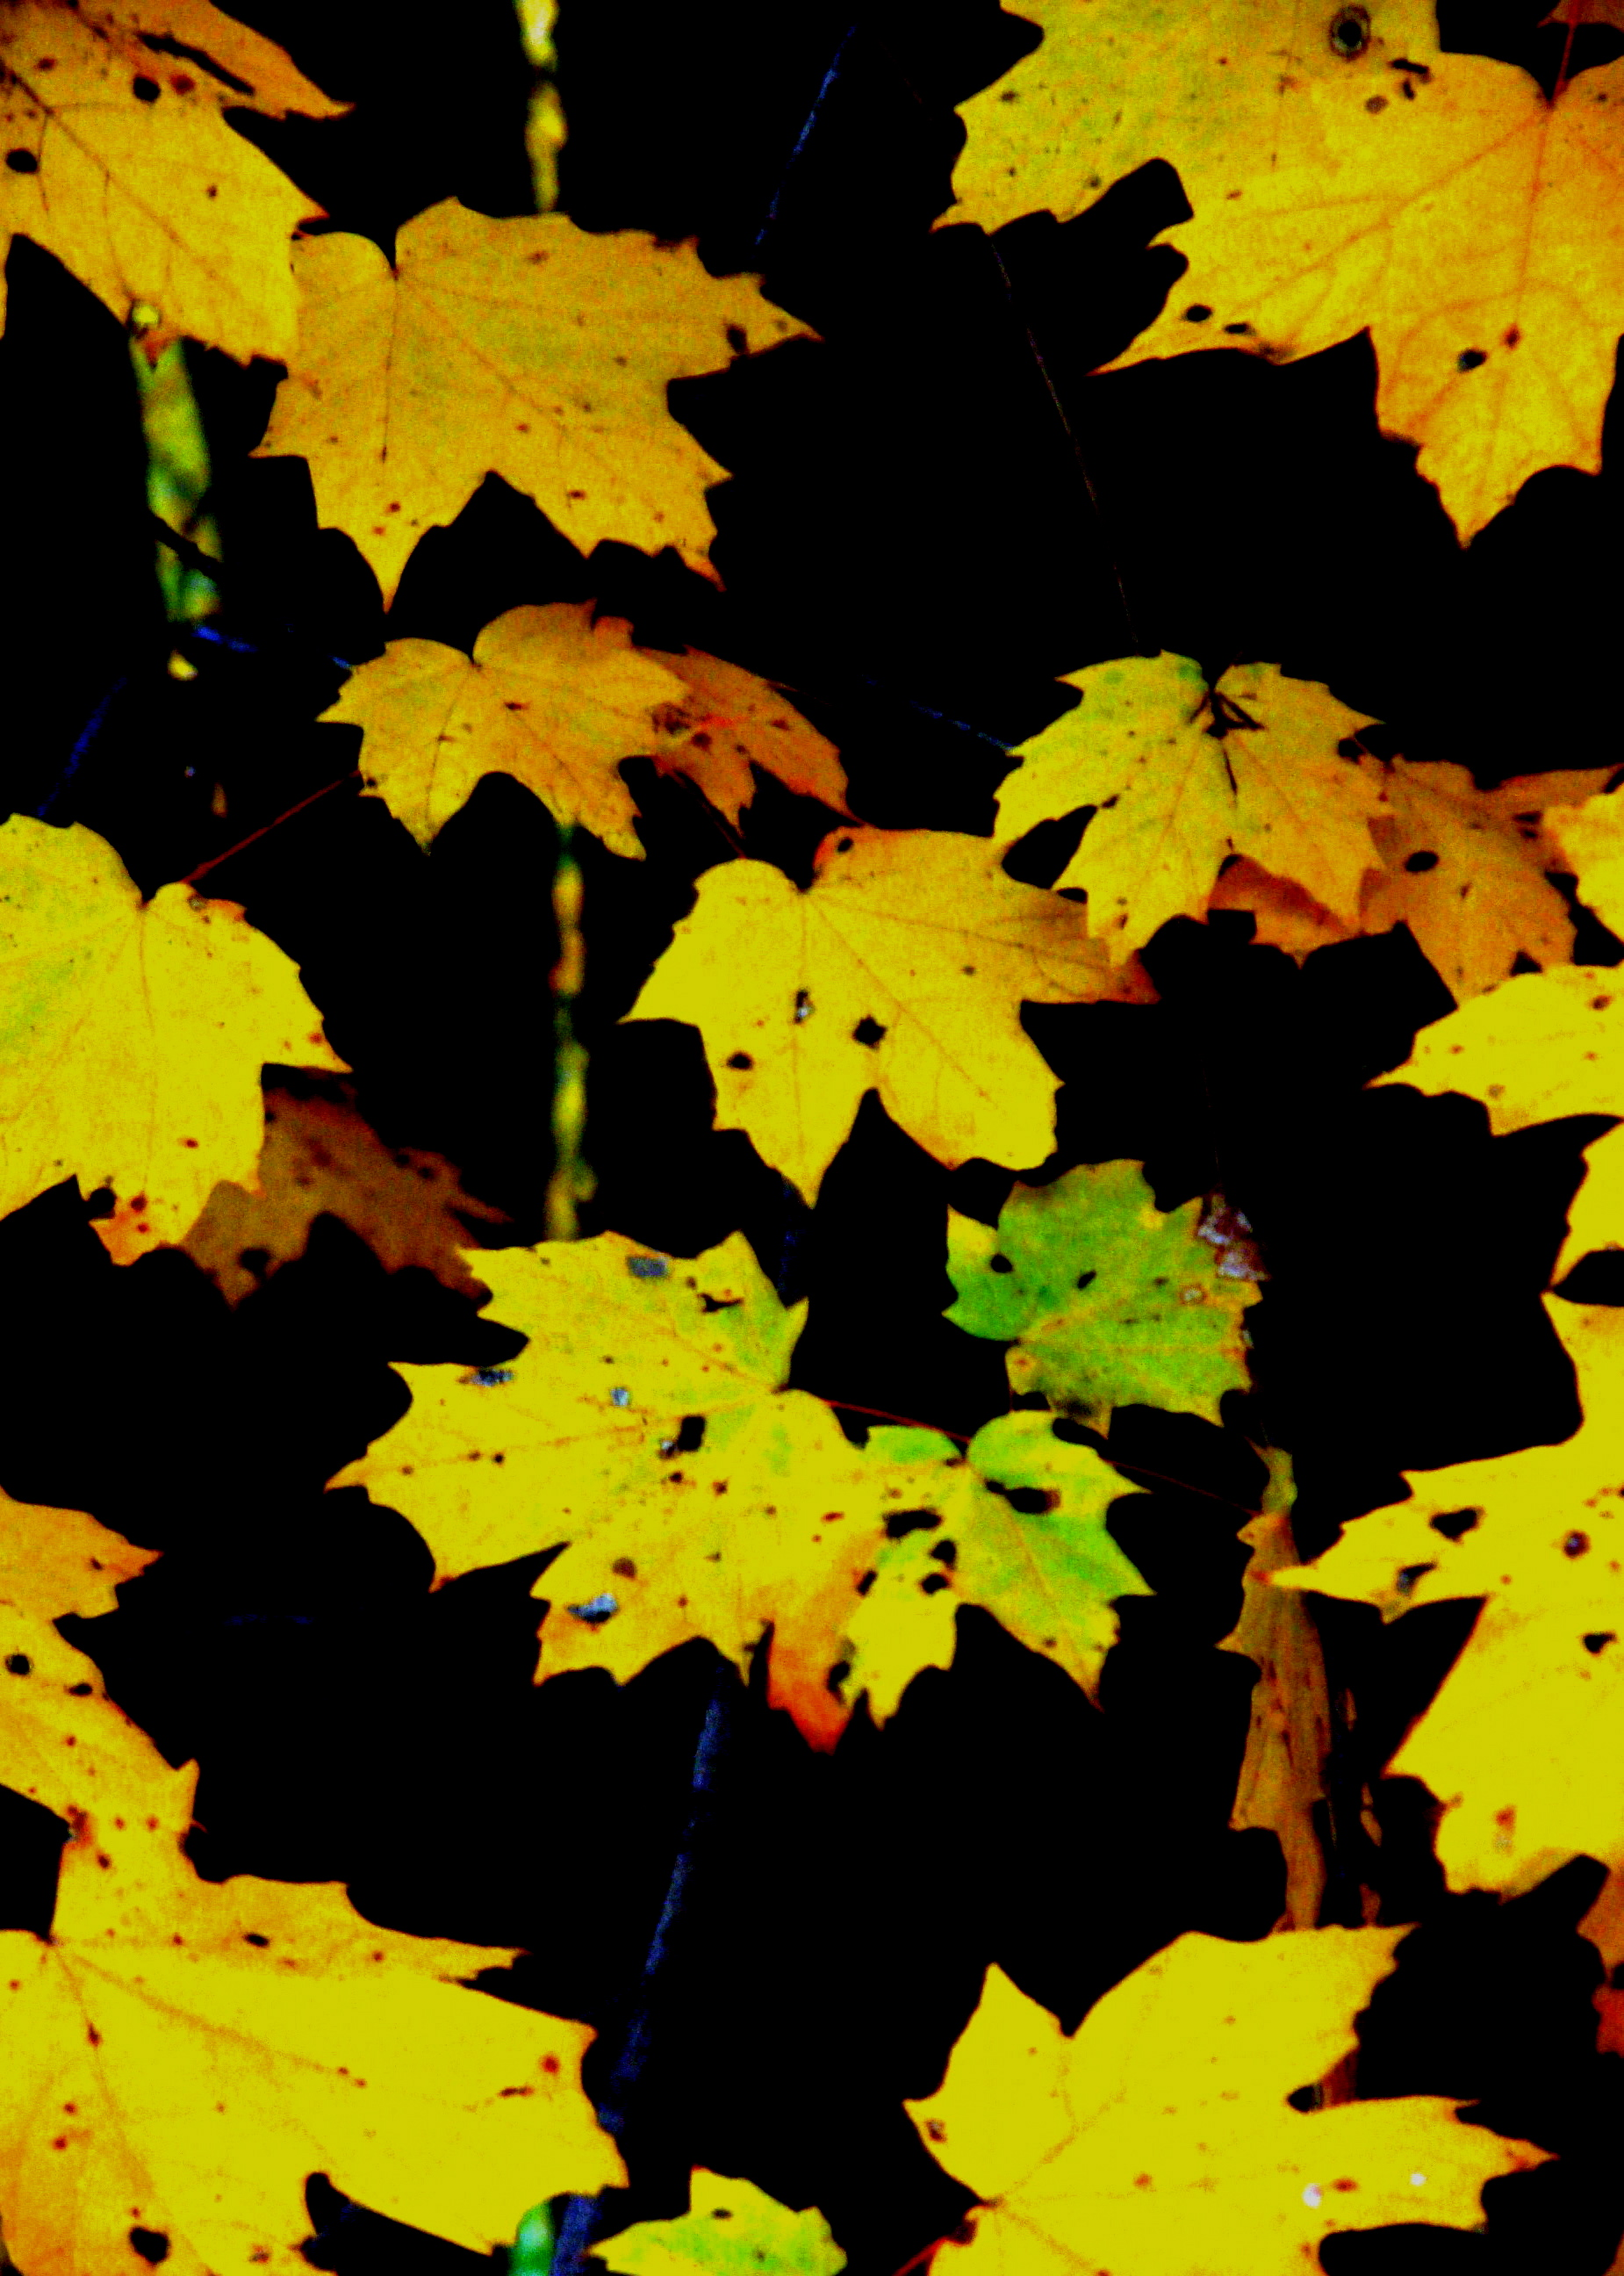 Autumn Leaves Rotary Park Huntington West Virginia Octo Flickr Photo Sharing